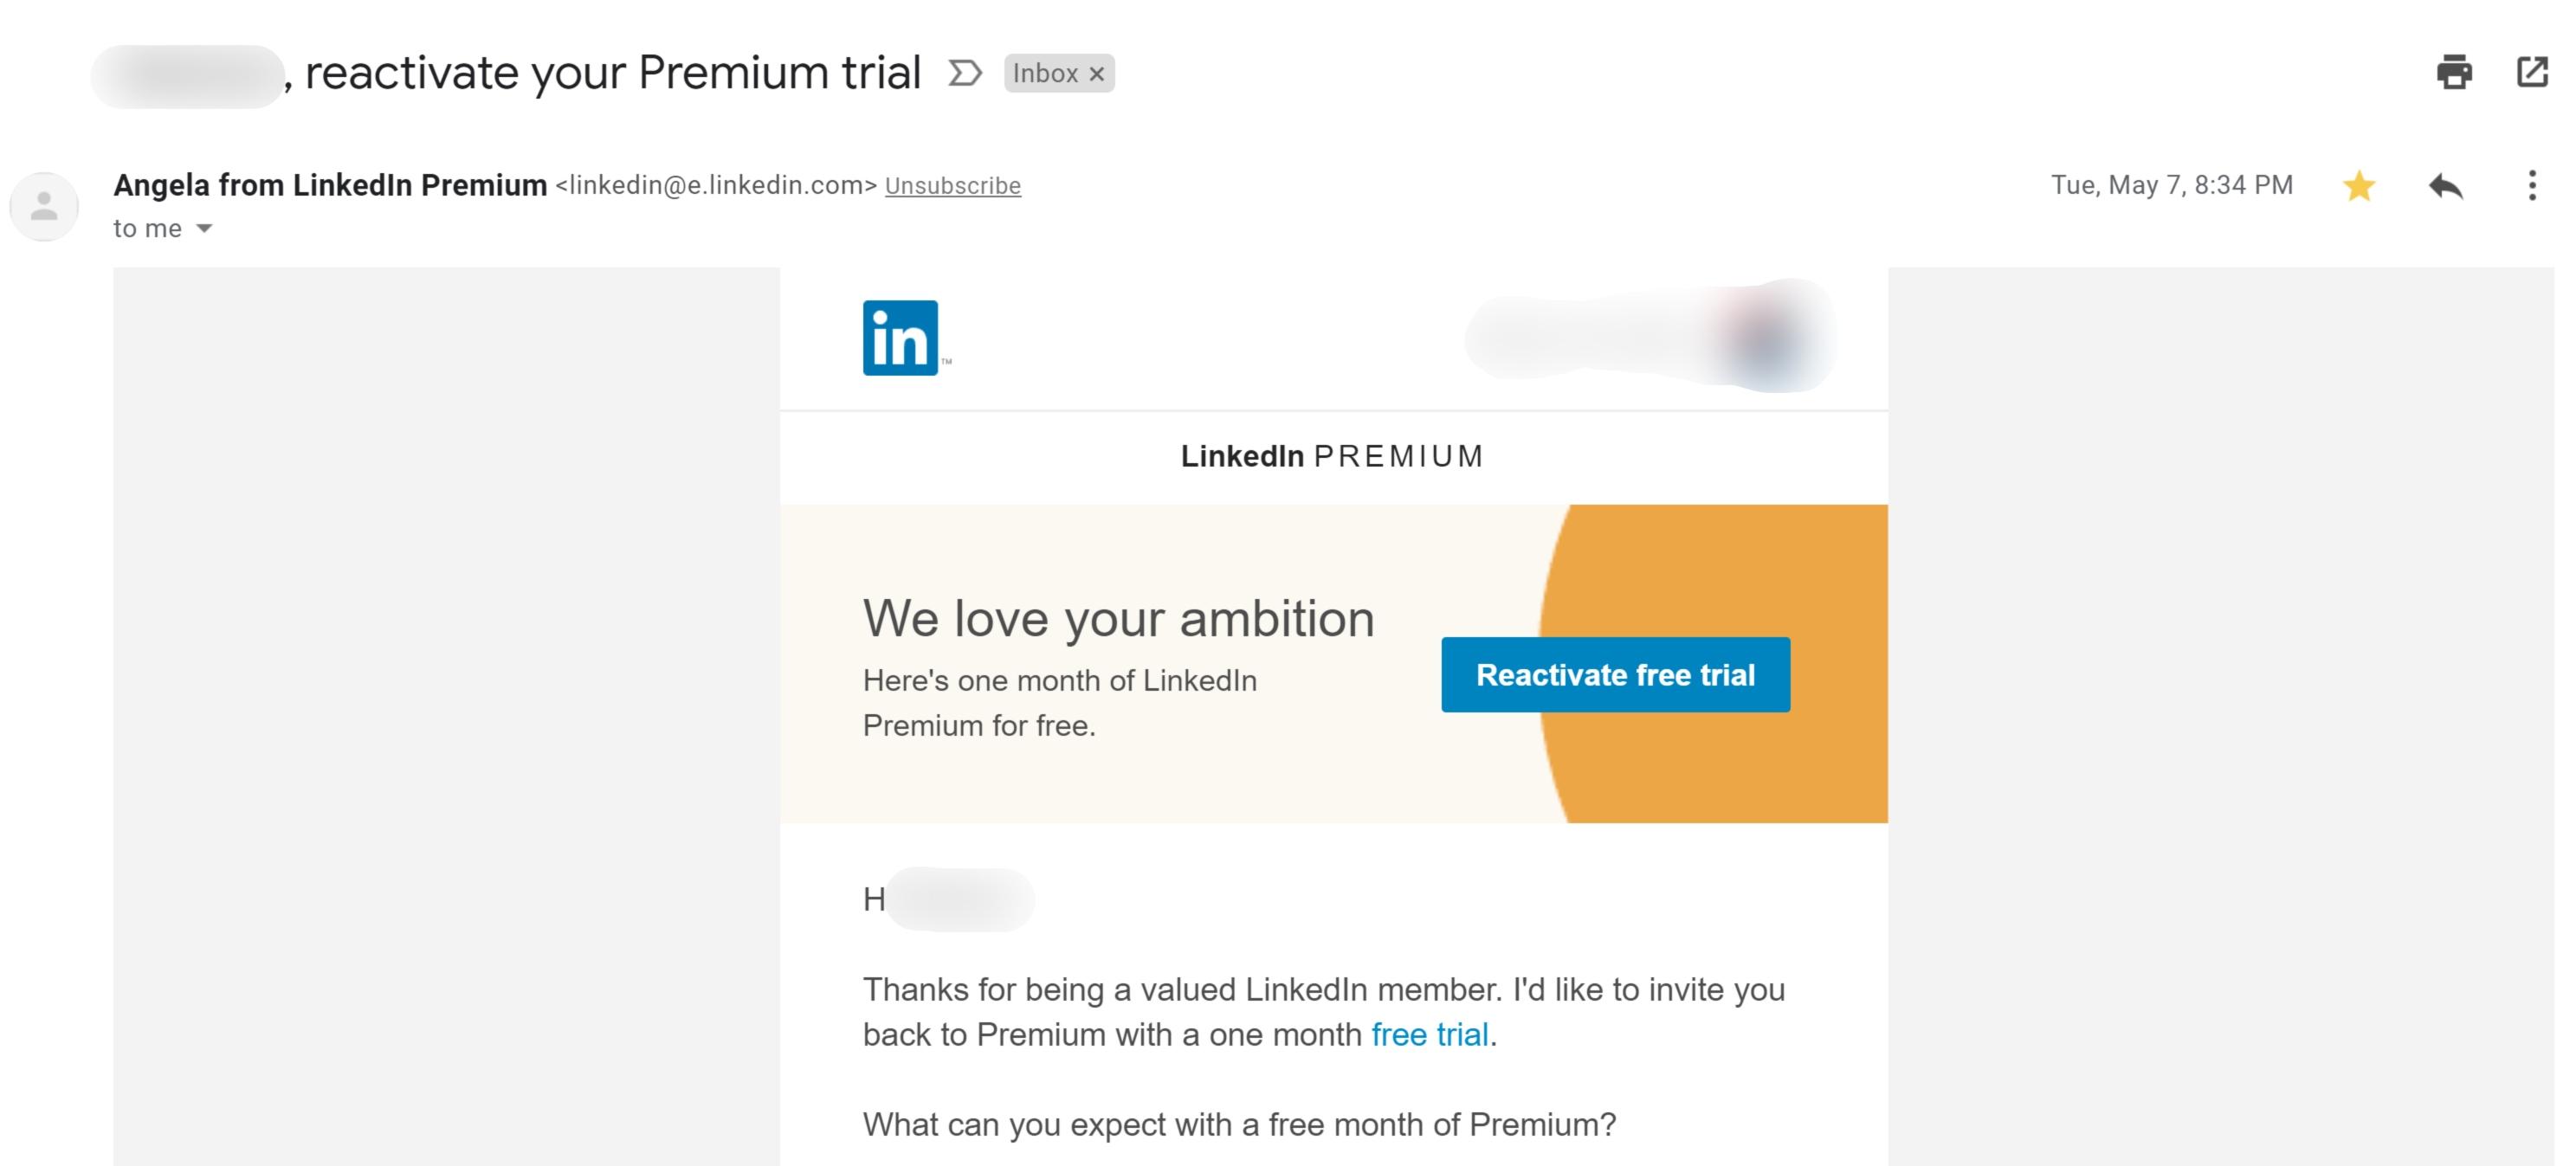 Free Linkedin Premium Reactivation offer via Email